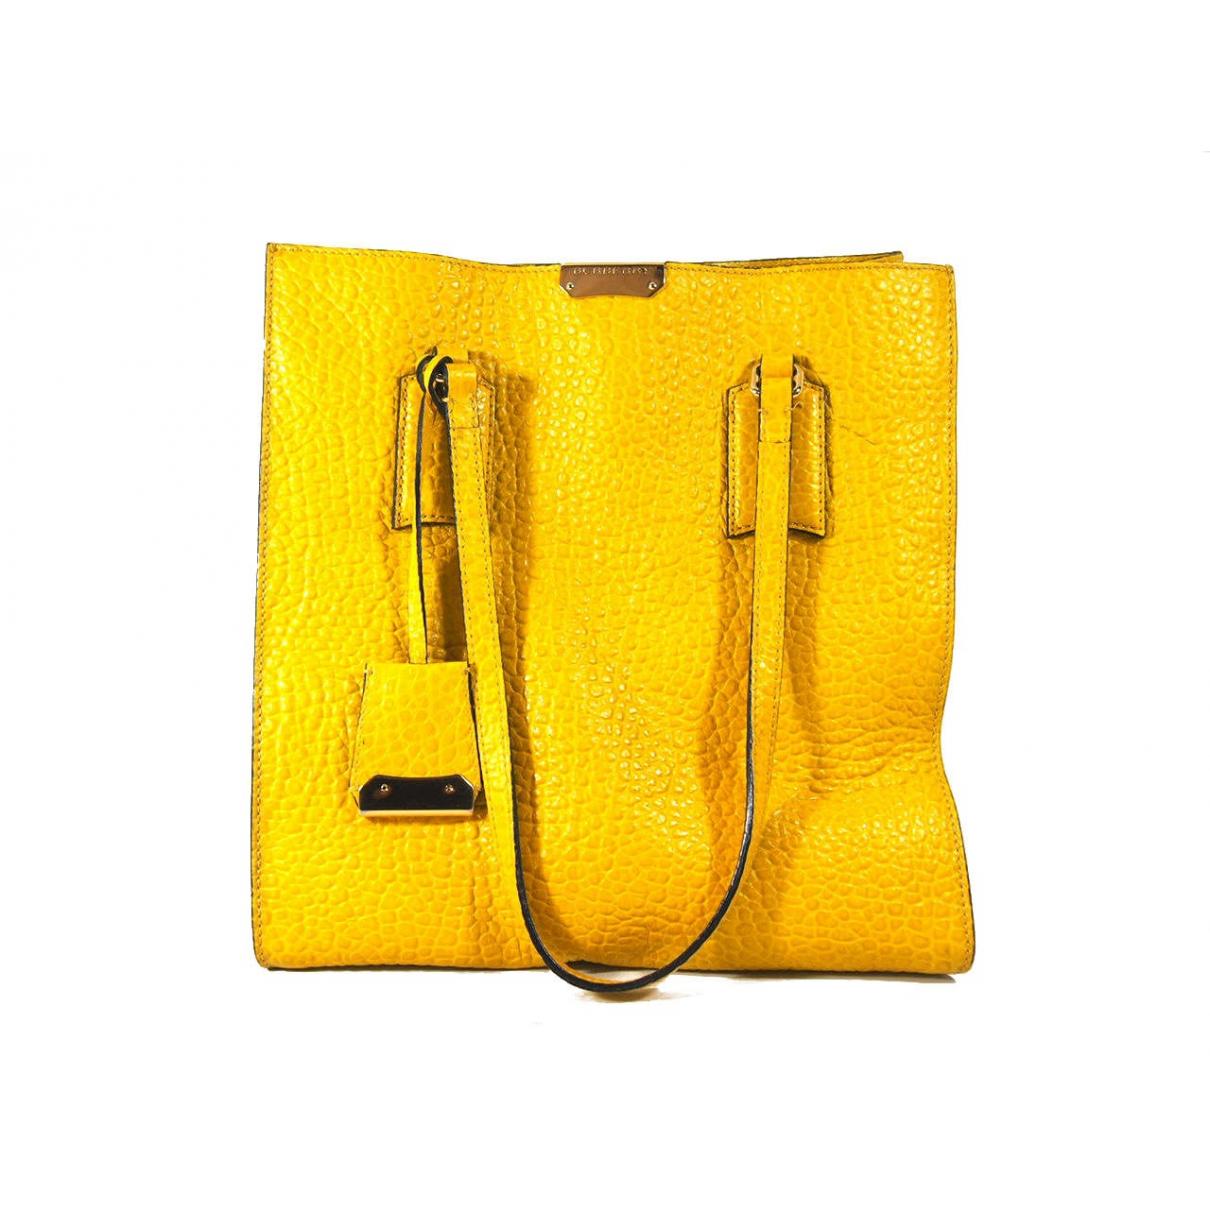 Burberry N Yellow Leather handbag for Women N